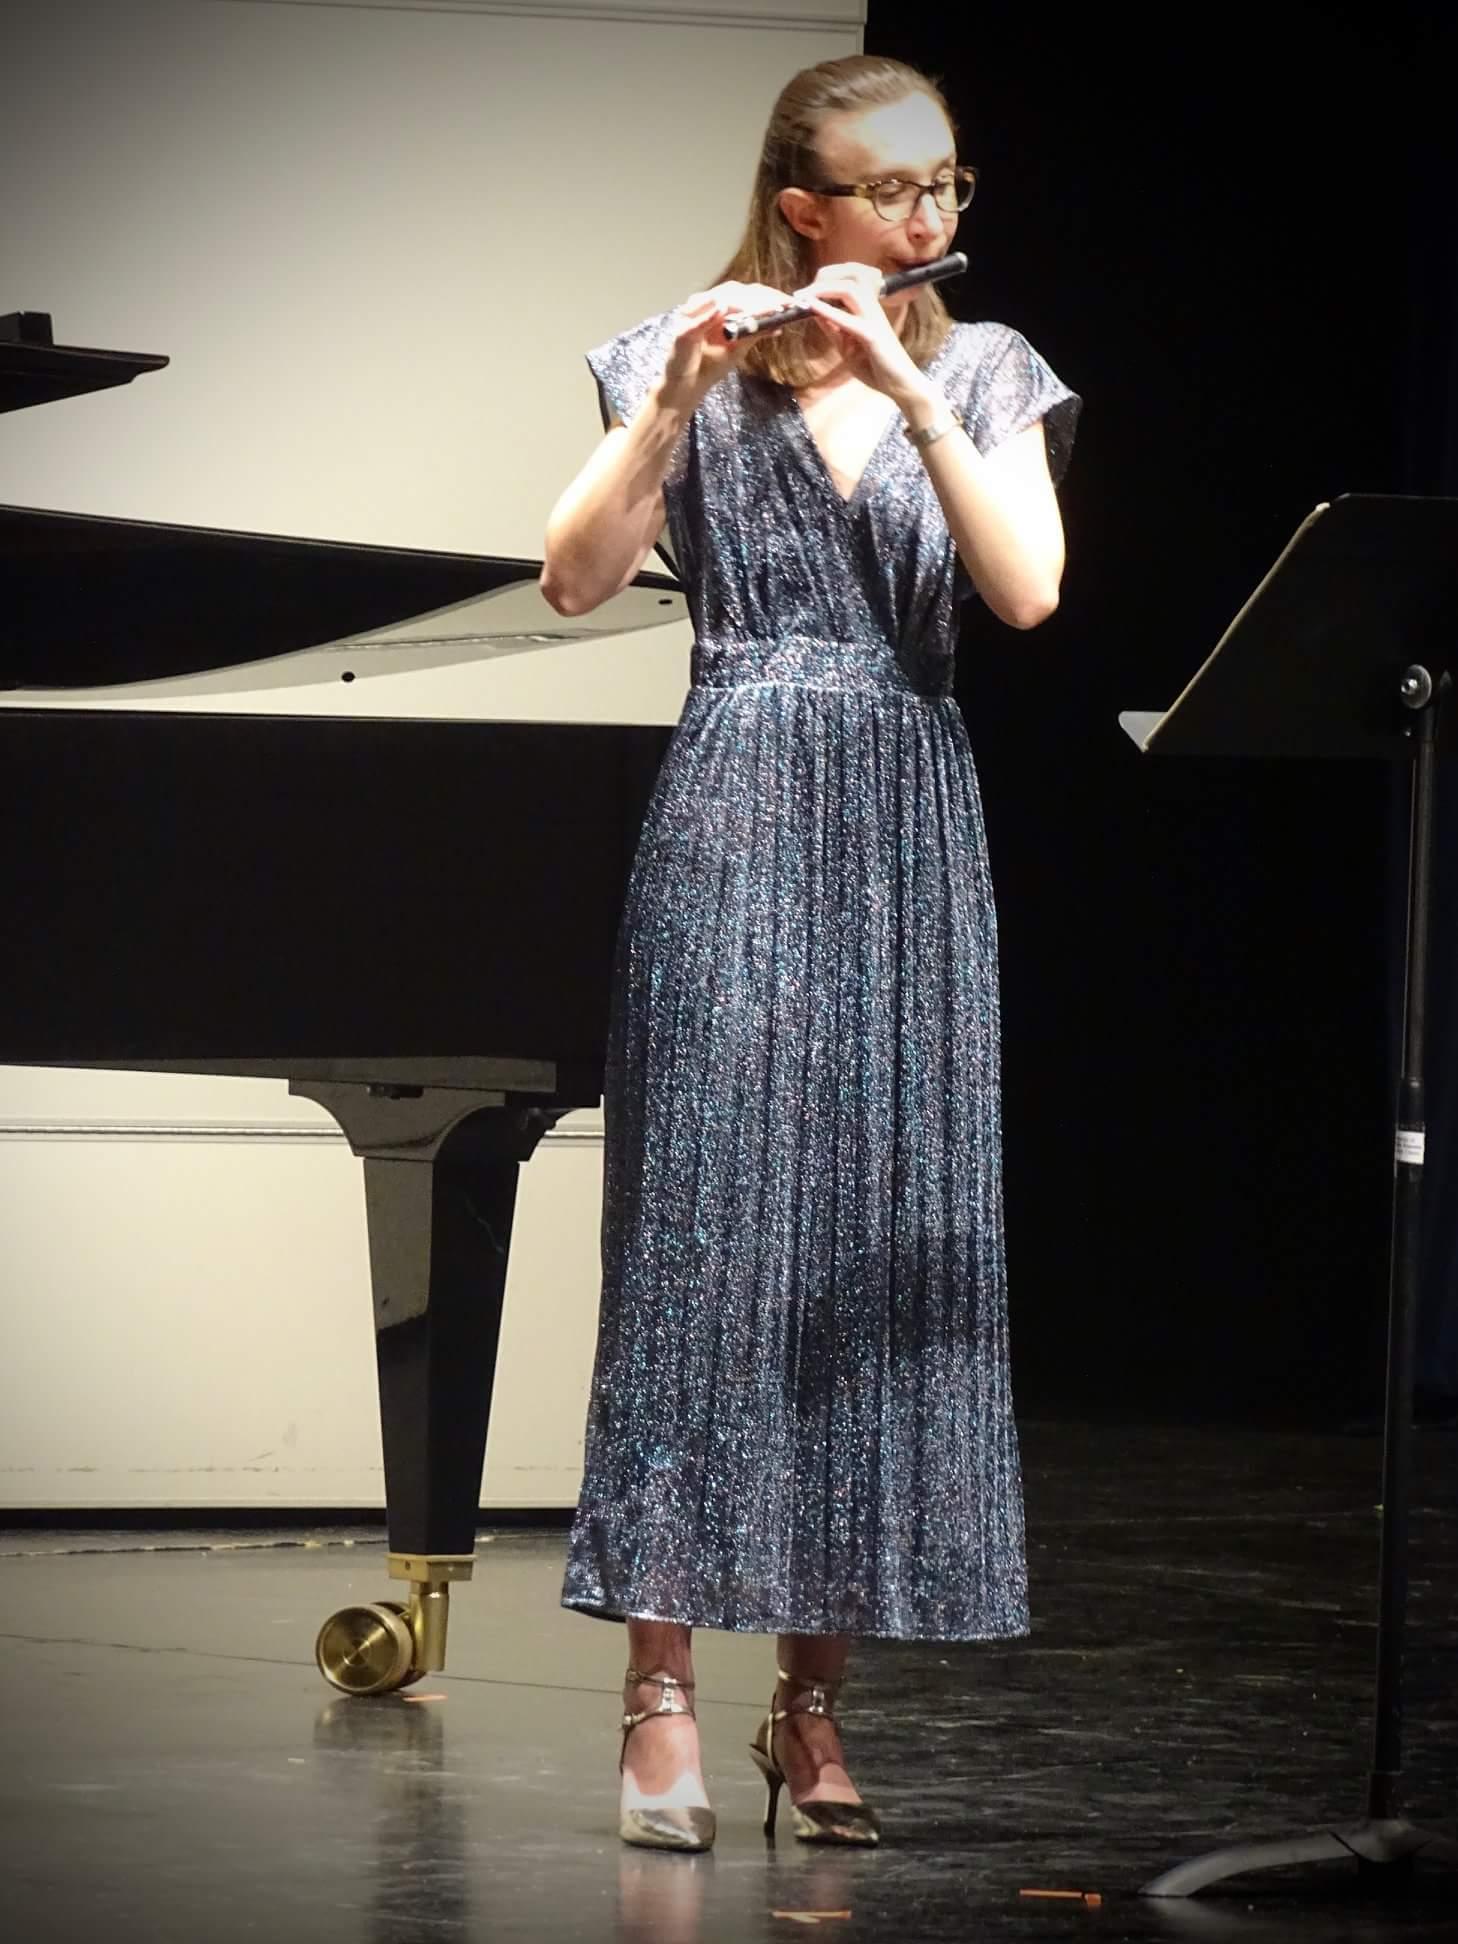 Music Rachael Dobosz